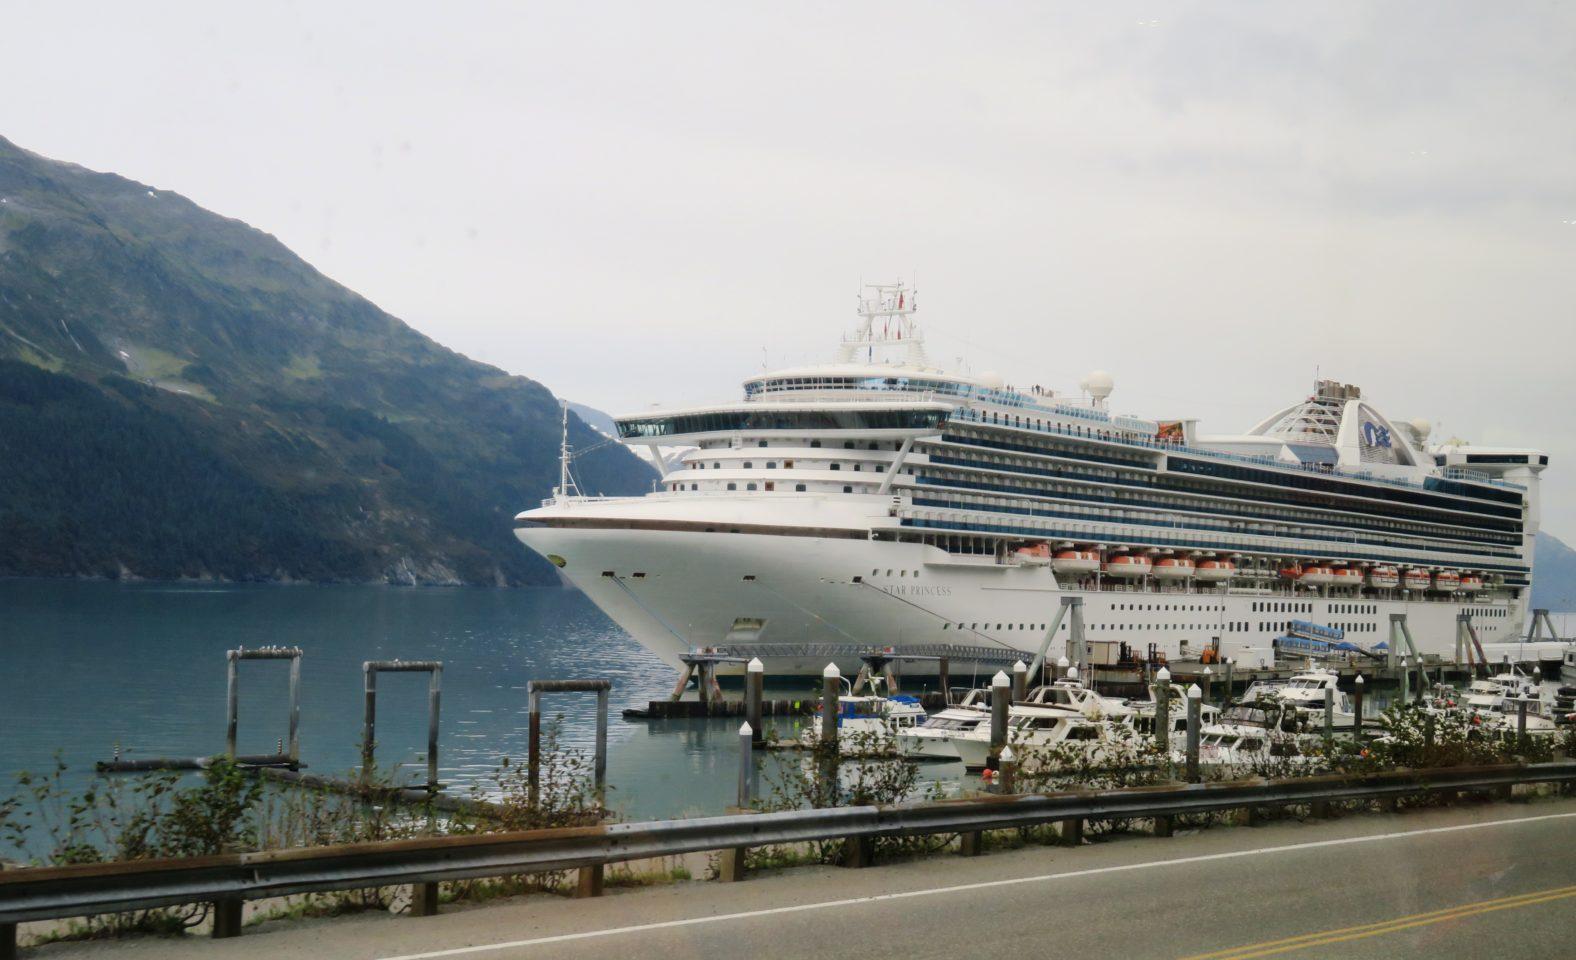 Princess Cruises ship Star Princess waiting at end of Princess Rail rail line ~ Alaska Cruise Tour